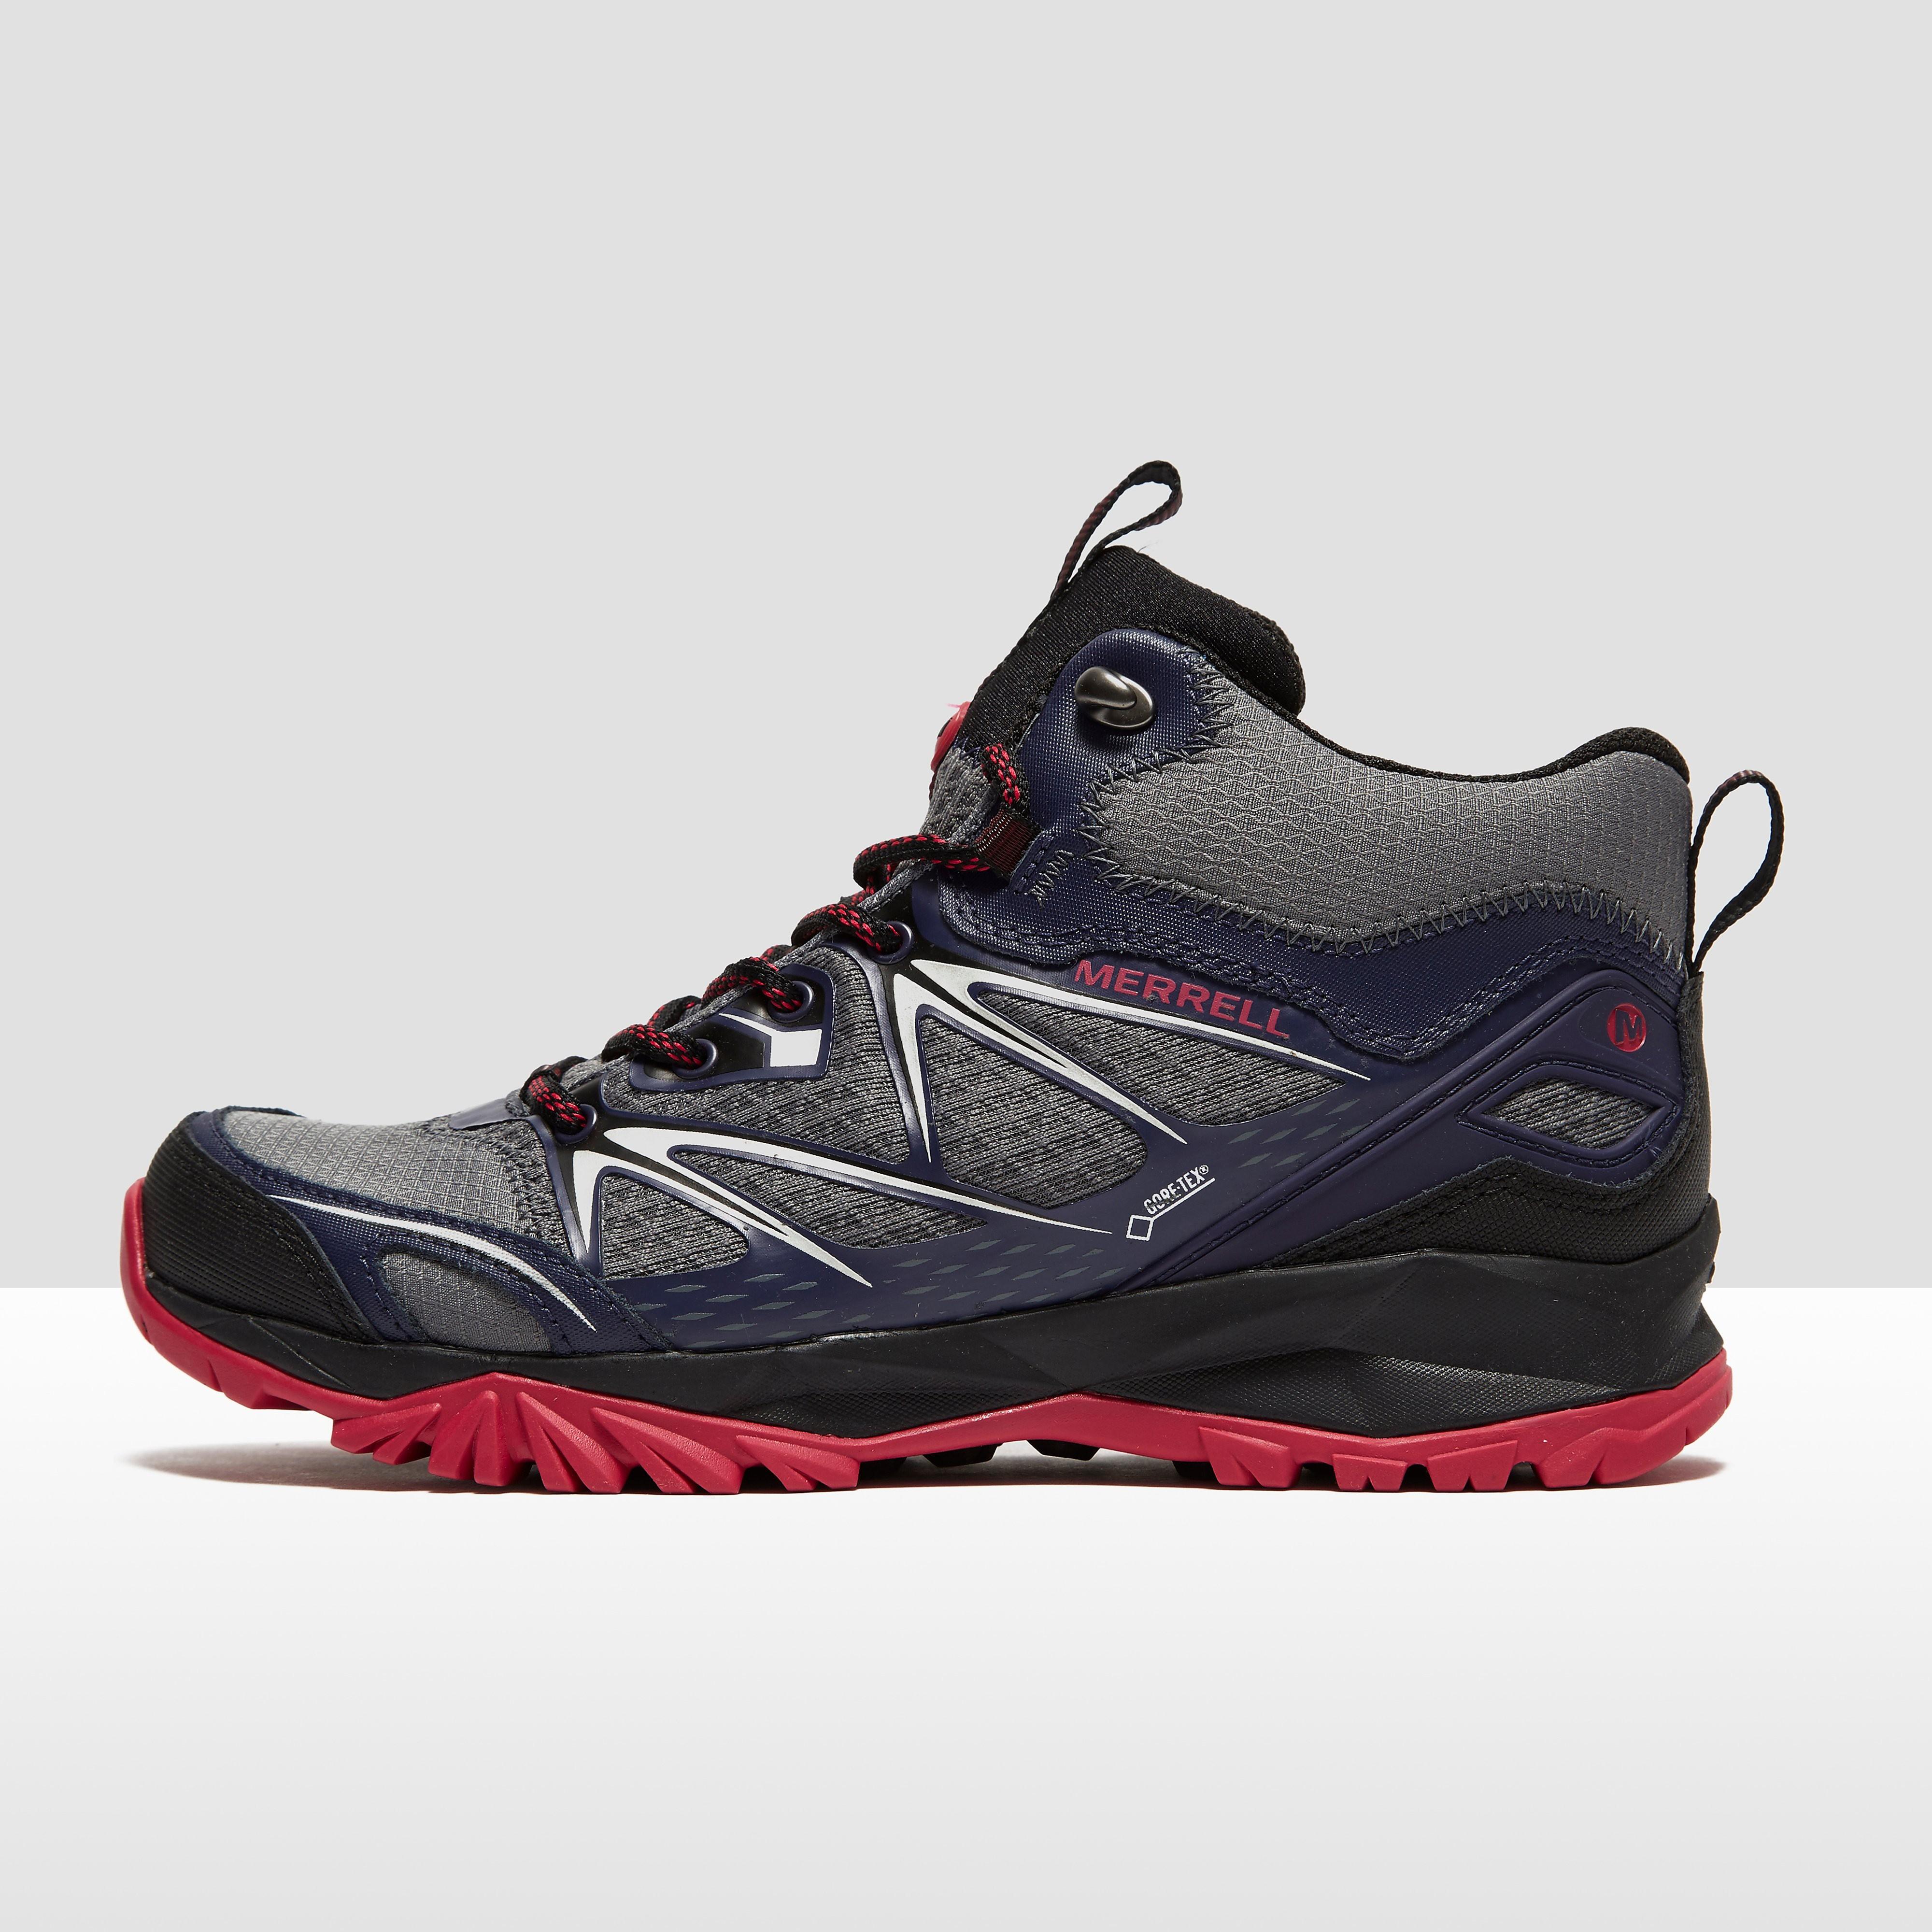 Merrell Capra Bold Mid GTX Walking Boots